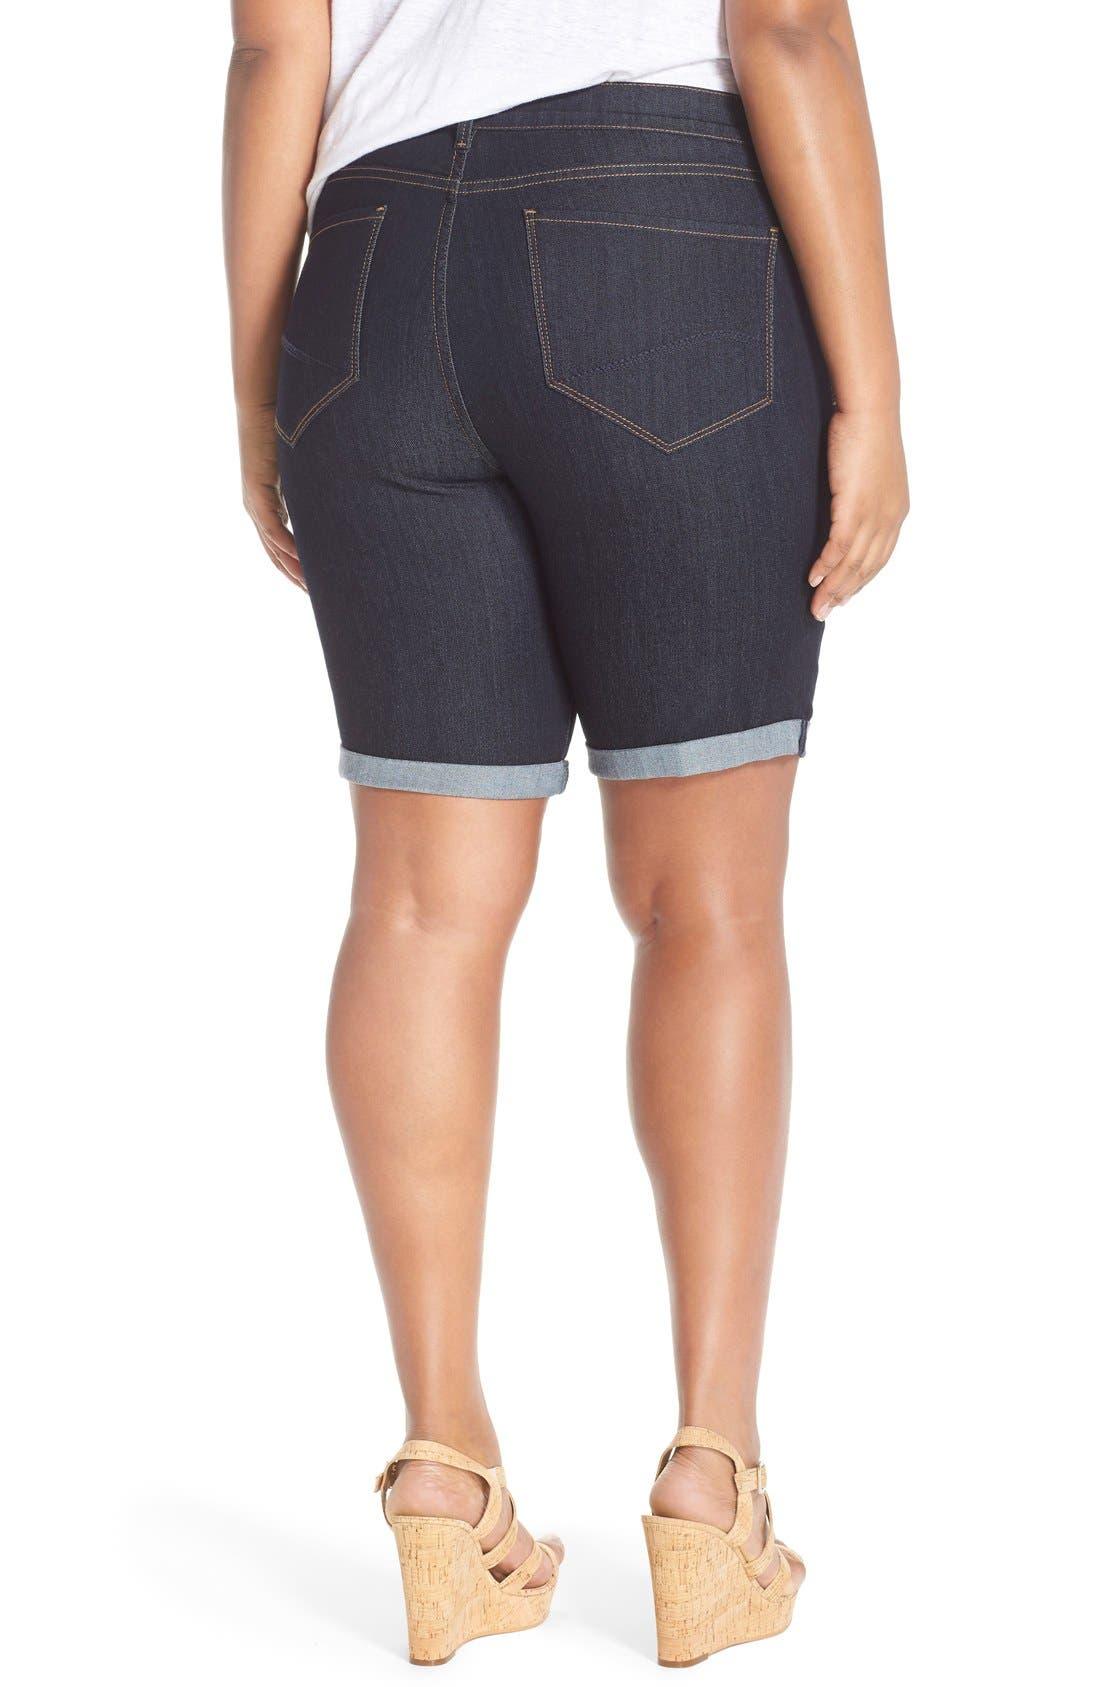 Alternate Image 2  - NYDJ 'Briella' Stretch Roll Cuff Denim Shorts (Dark) (Plus Size)